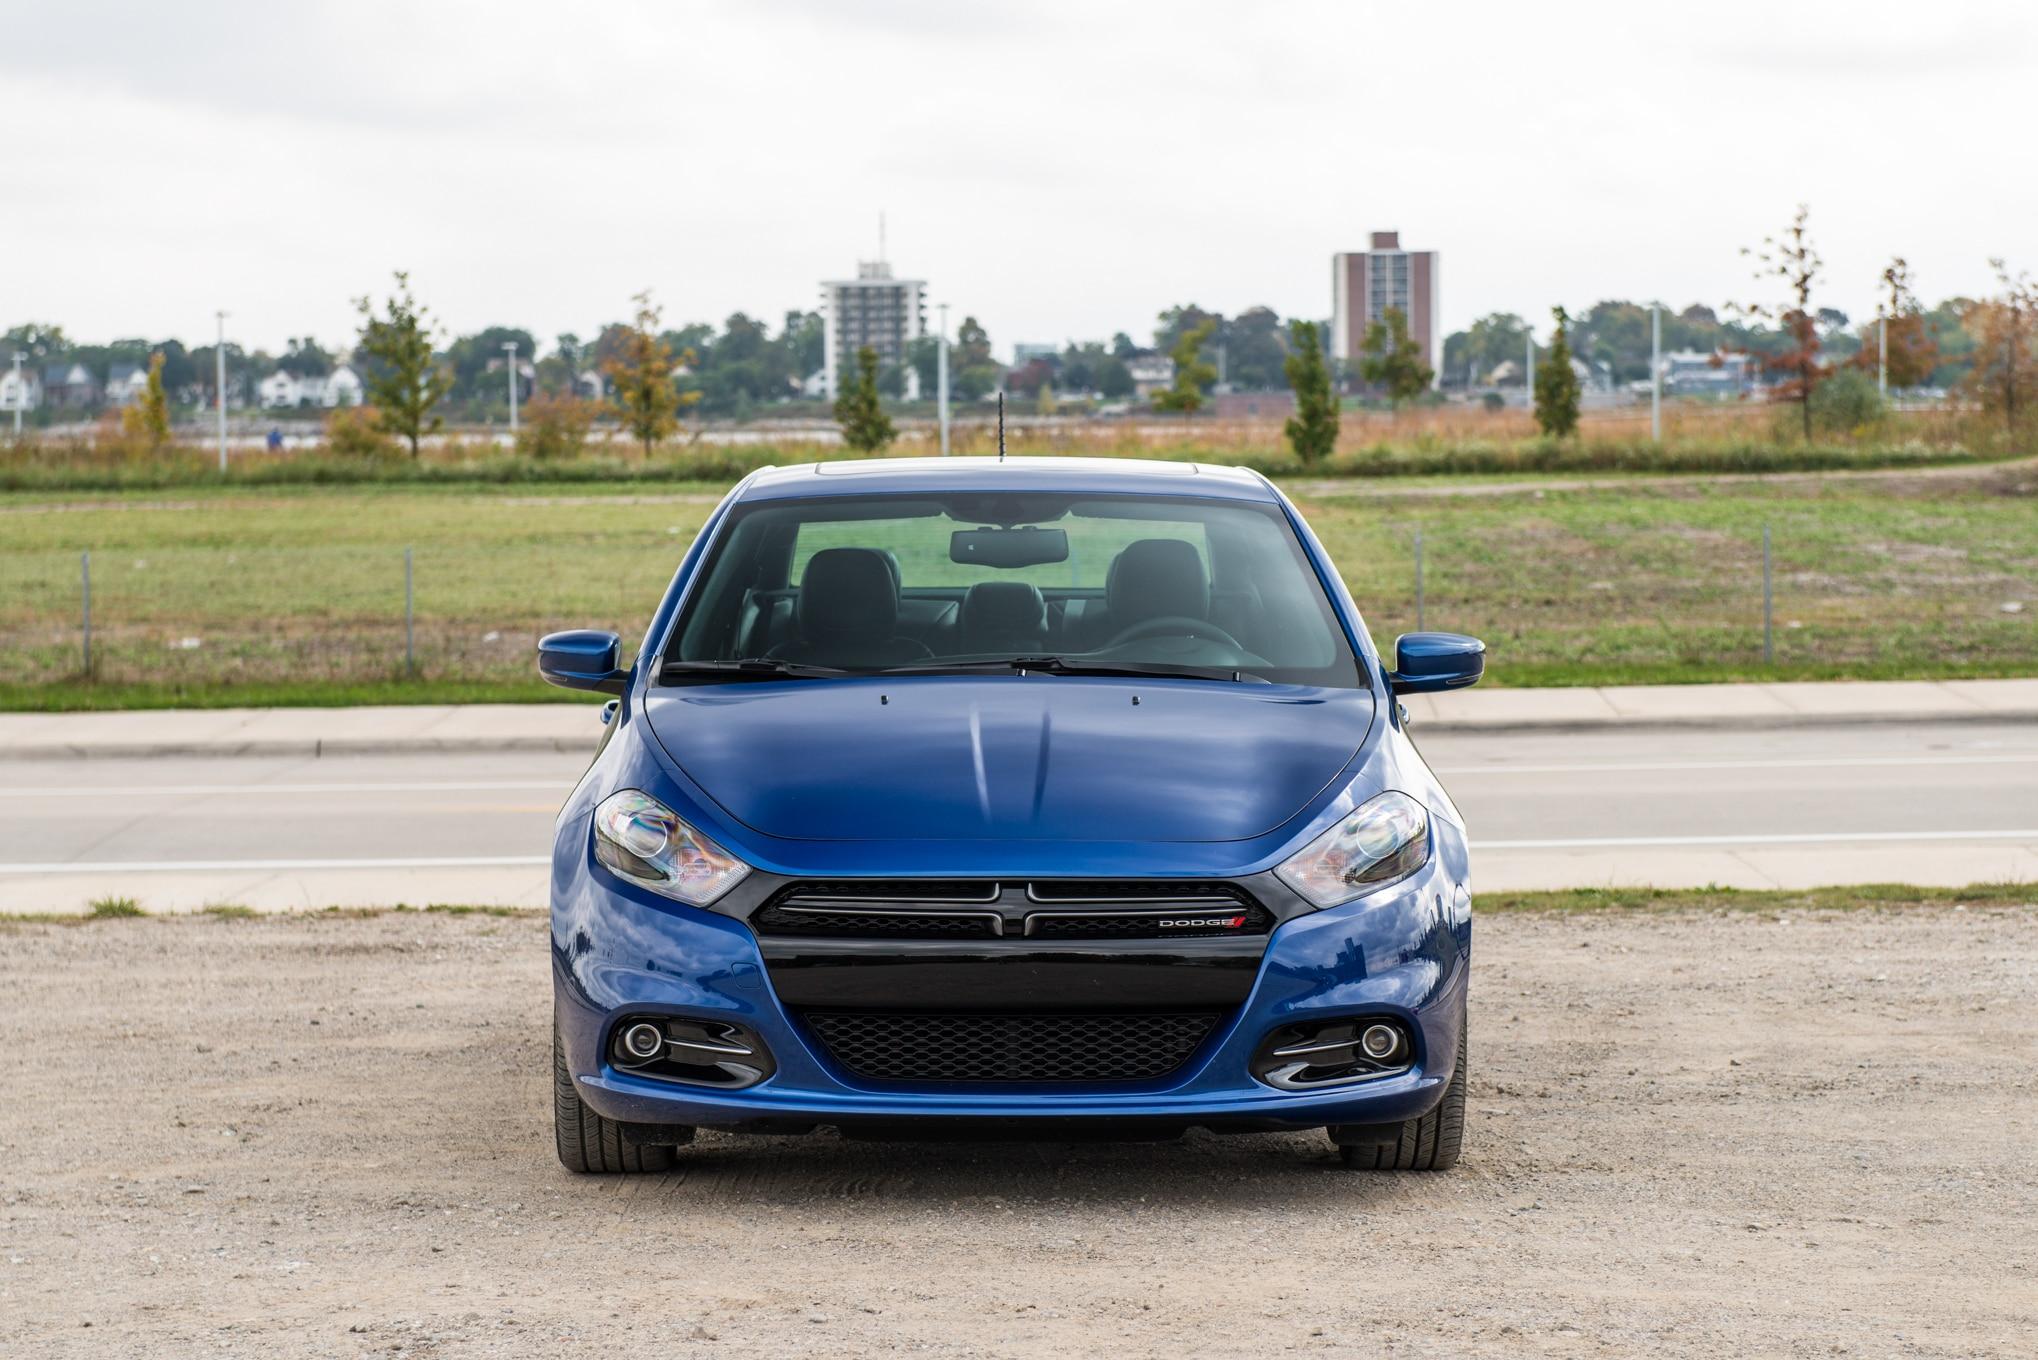 2014 compact sedan comparison review day 2 automobile magazine. Black Bedroom Furniture Sets. Home Design Ideas